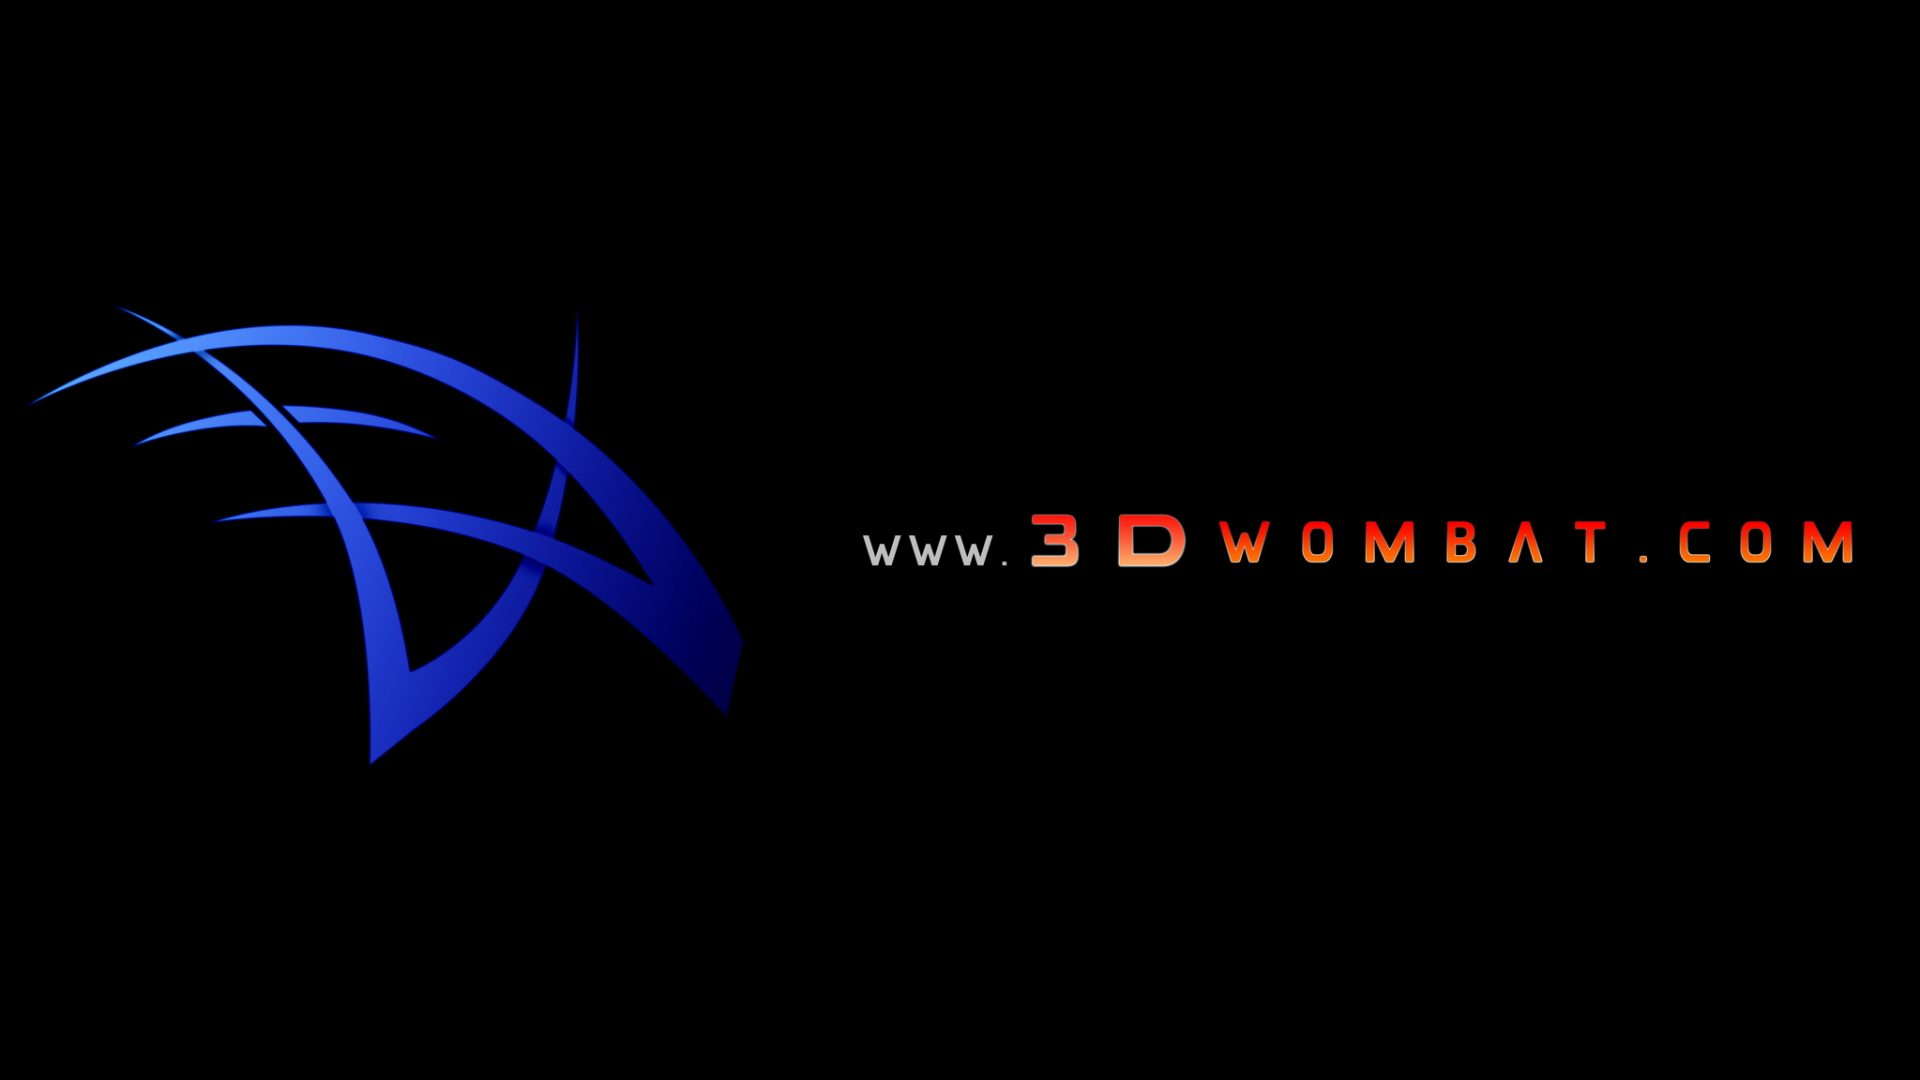 3D Wombat